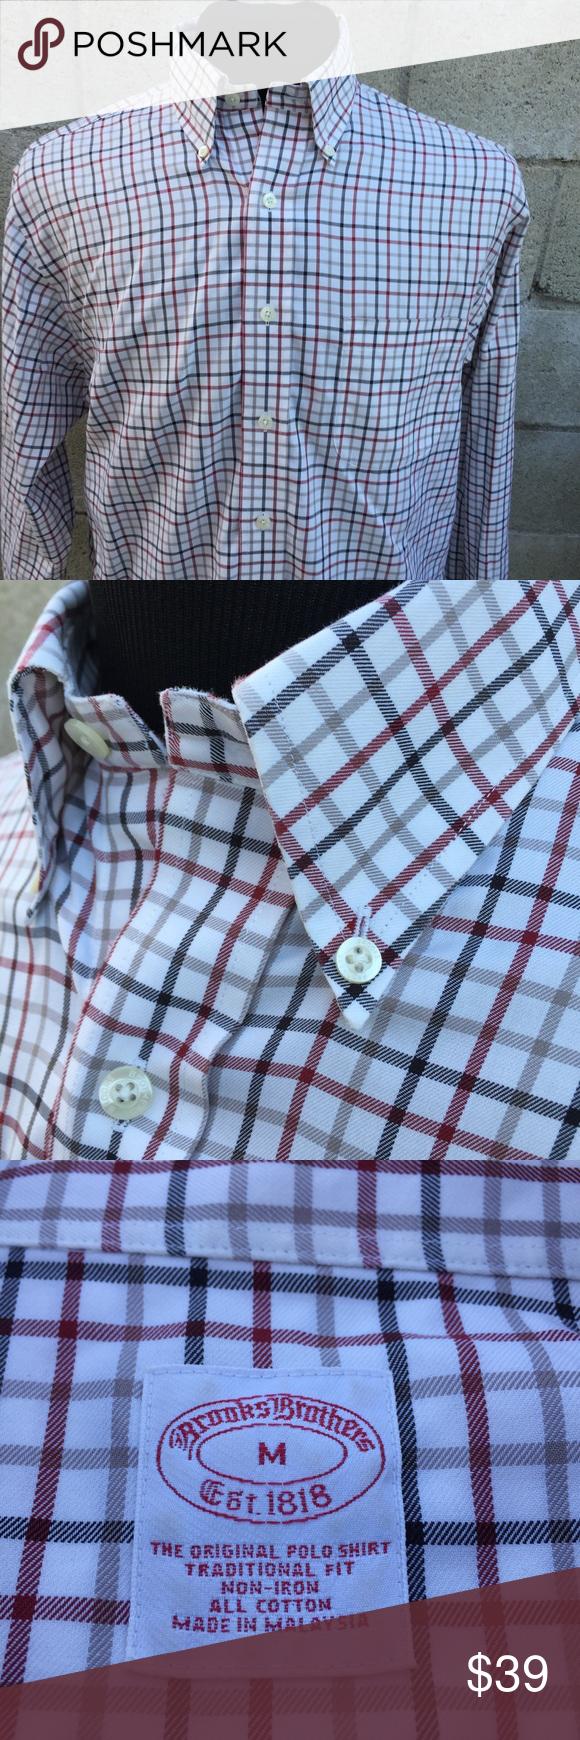 Green checkered dress shirt  Brooks Brothers Non Iron Checkered Oxford Shirt M  Oxford shirts